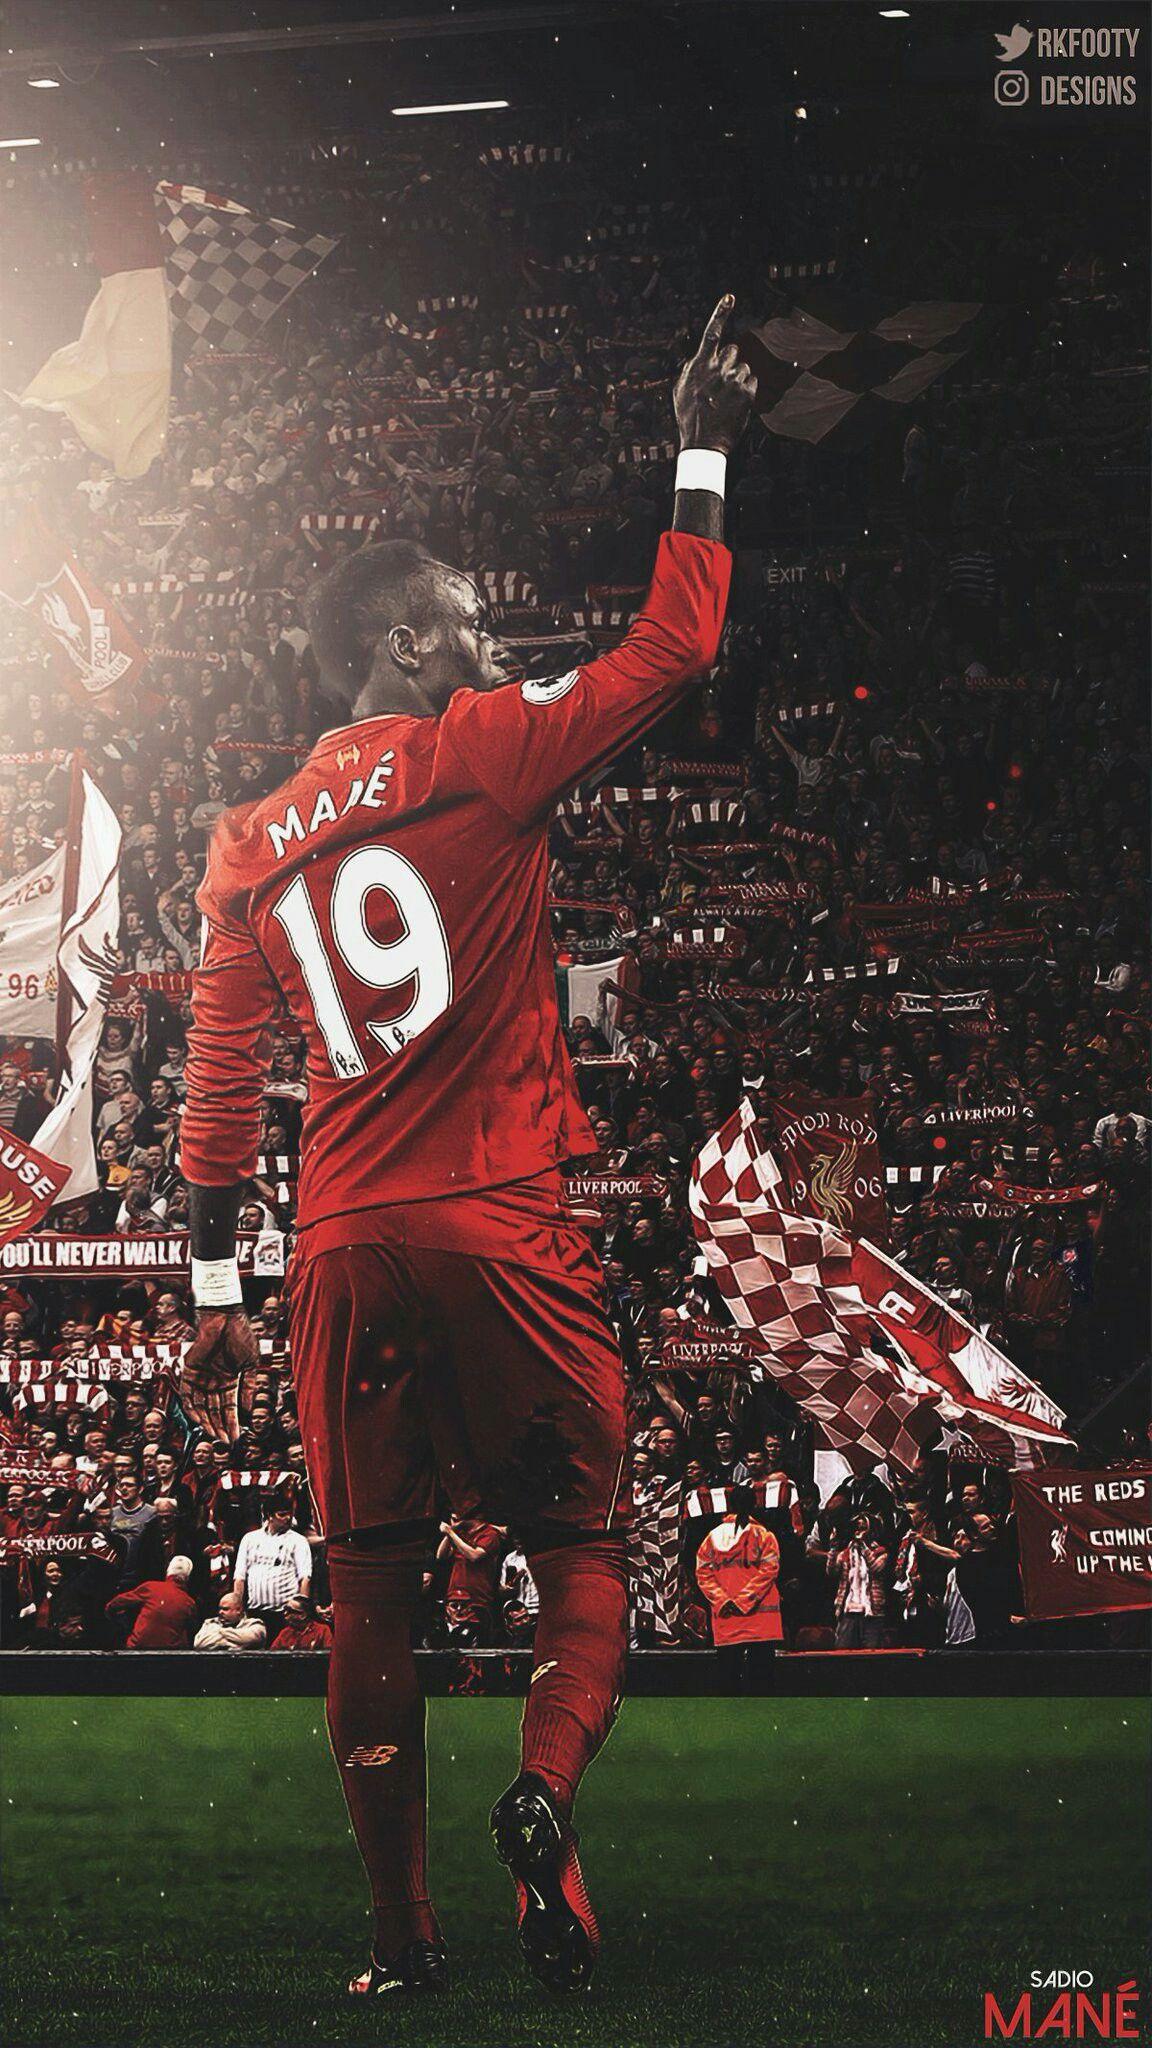 Pin de Nasser Salim en ليفربول | Pinterest | Fútbol y Deporte